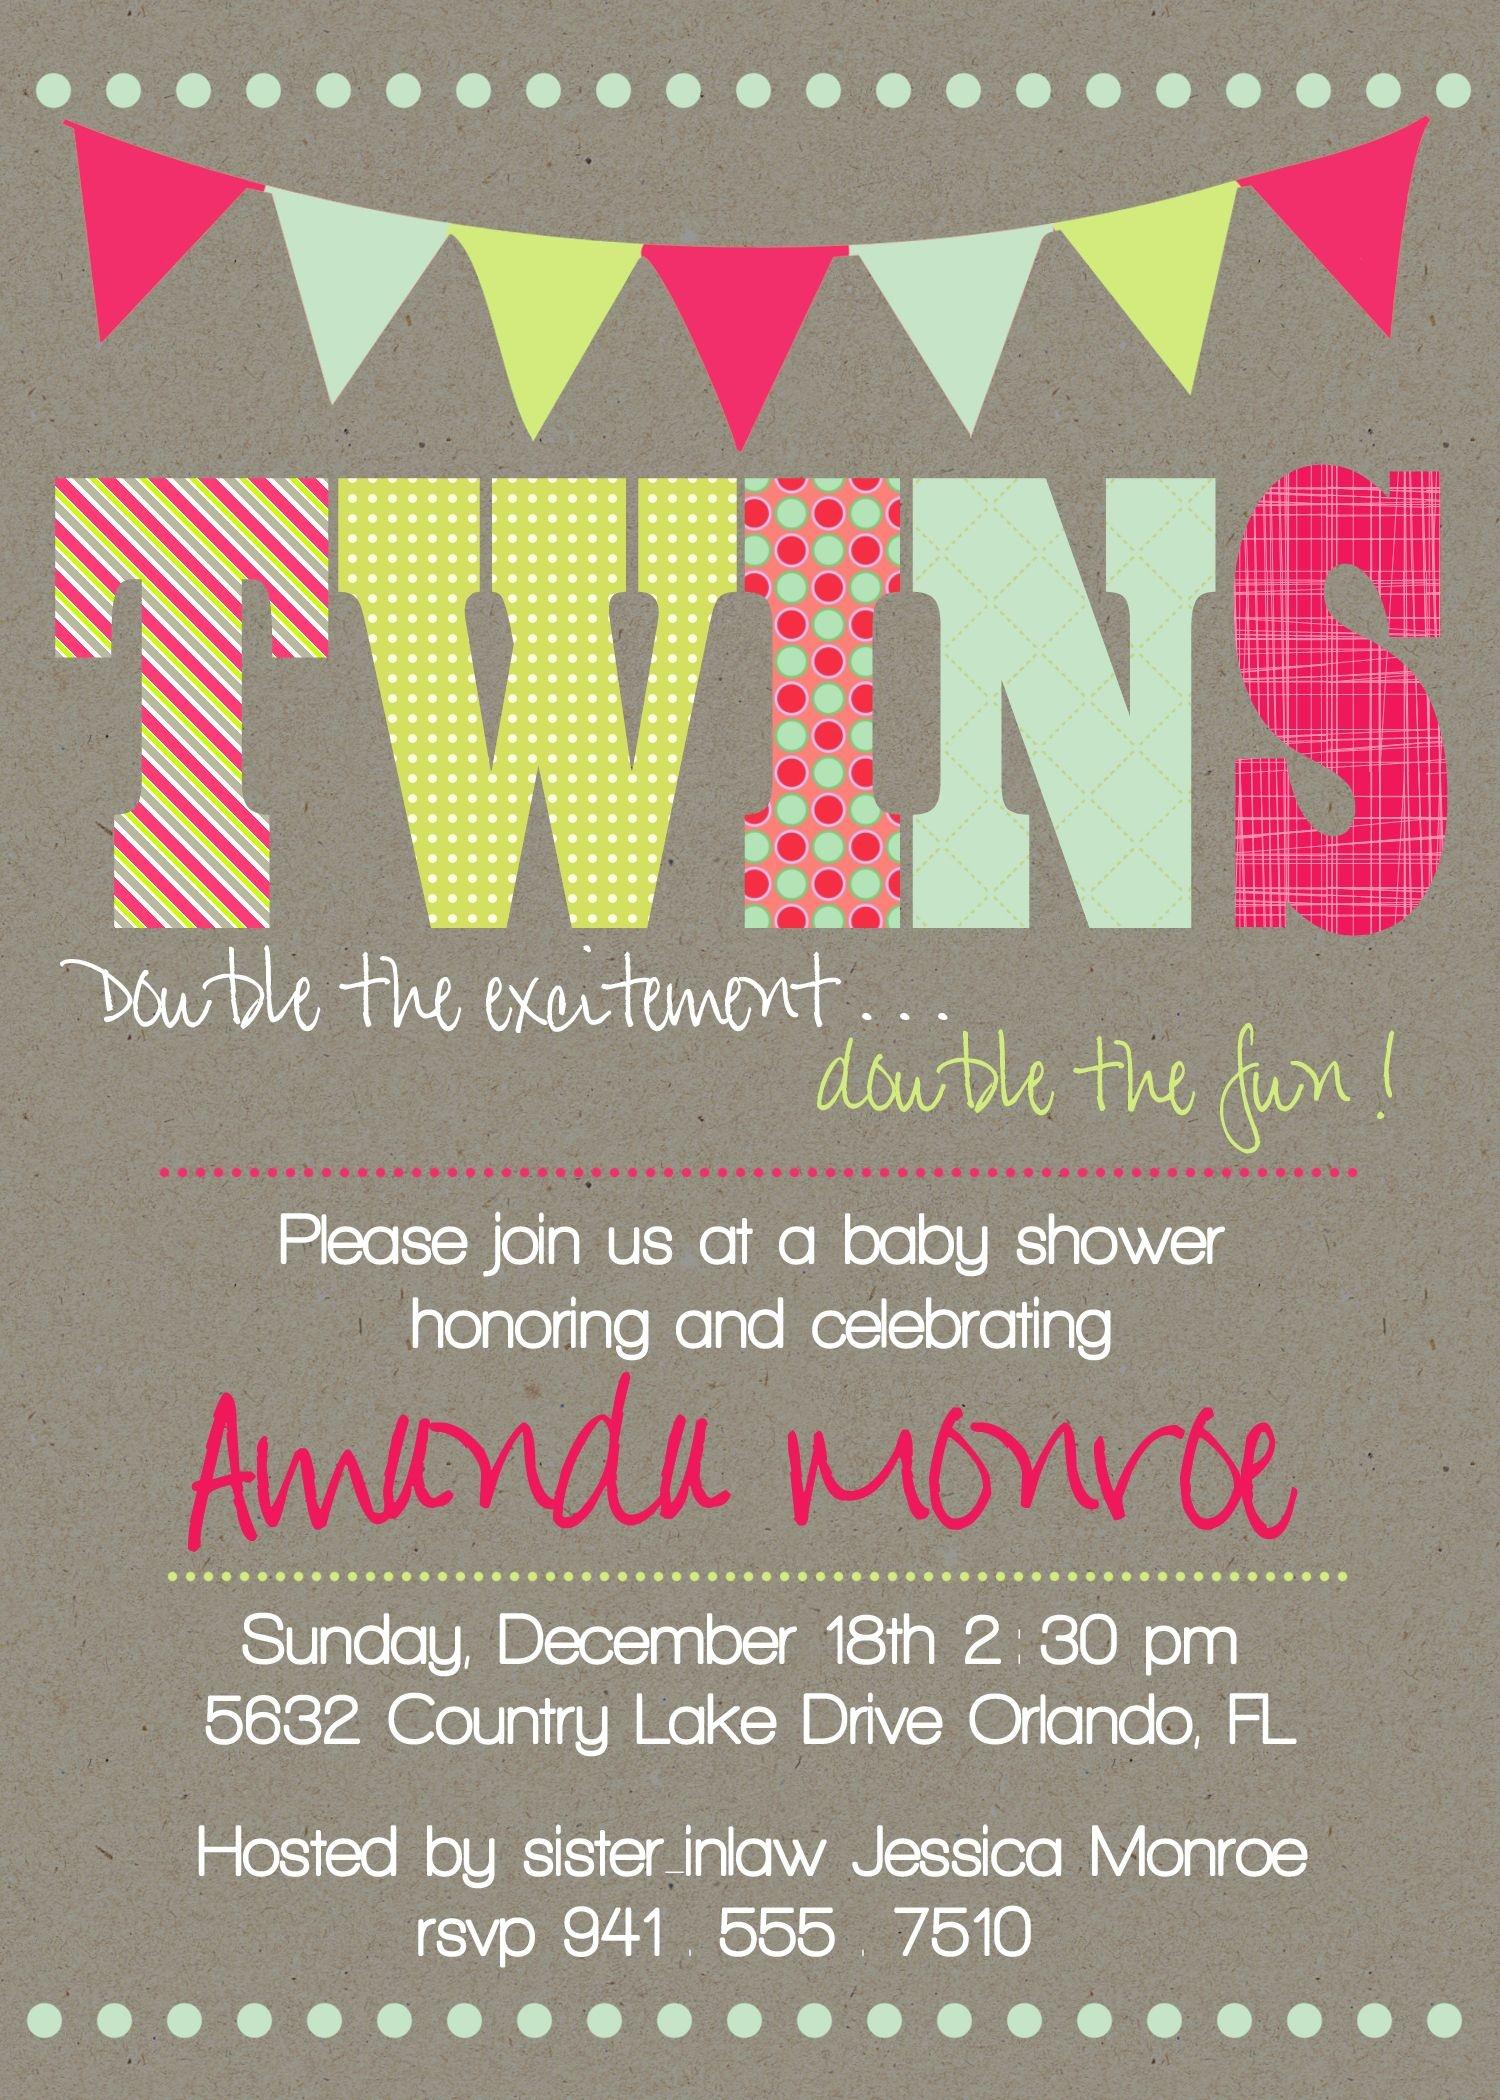 Pinanggunstore On Invitations Cardnataliesinvitation - Free Printable Twin Baby Shower Invitations